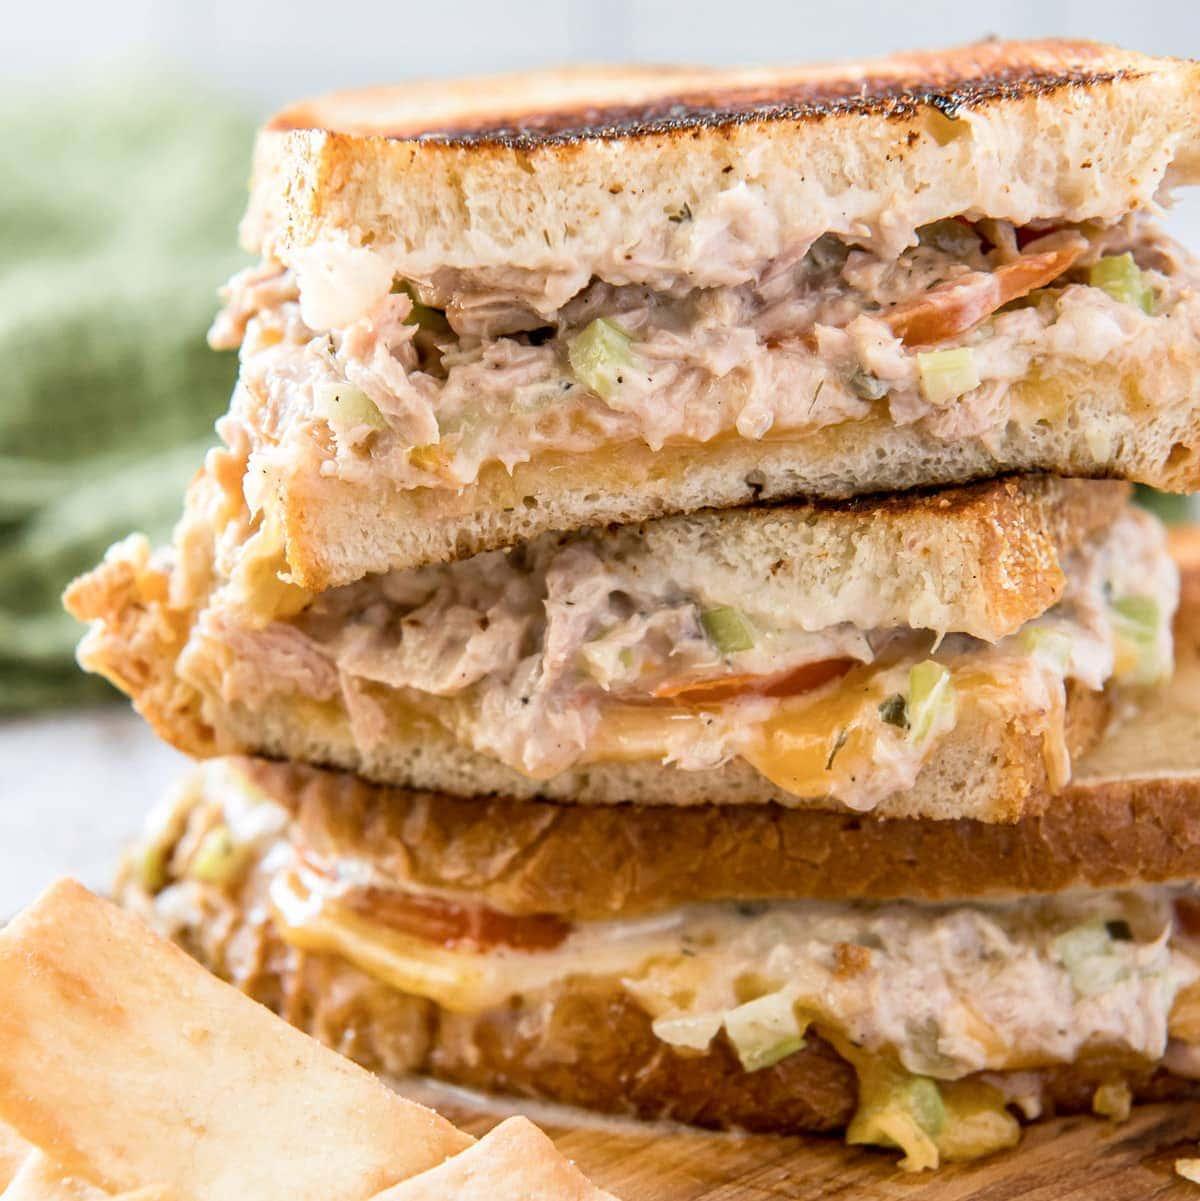 The Best Tuna Melt Sandwich